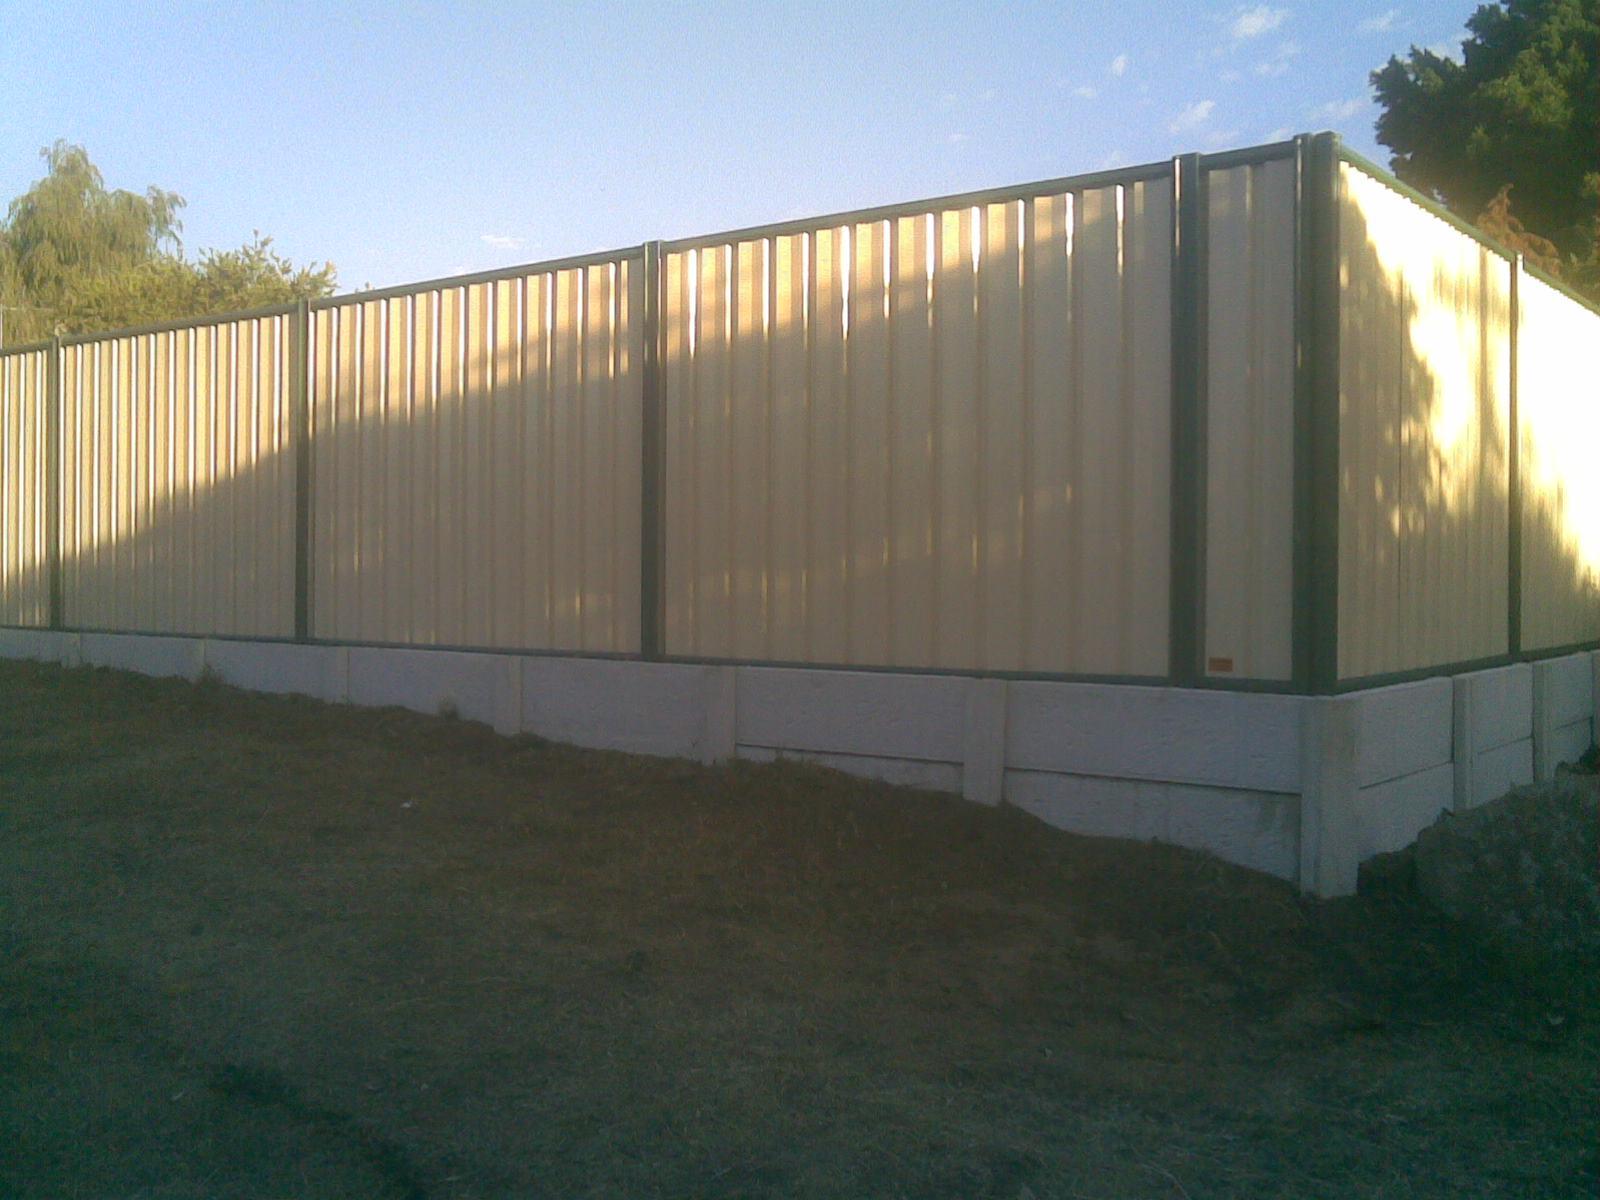 Retaining Walls Harrisdale Fencing Colorbond